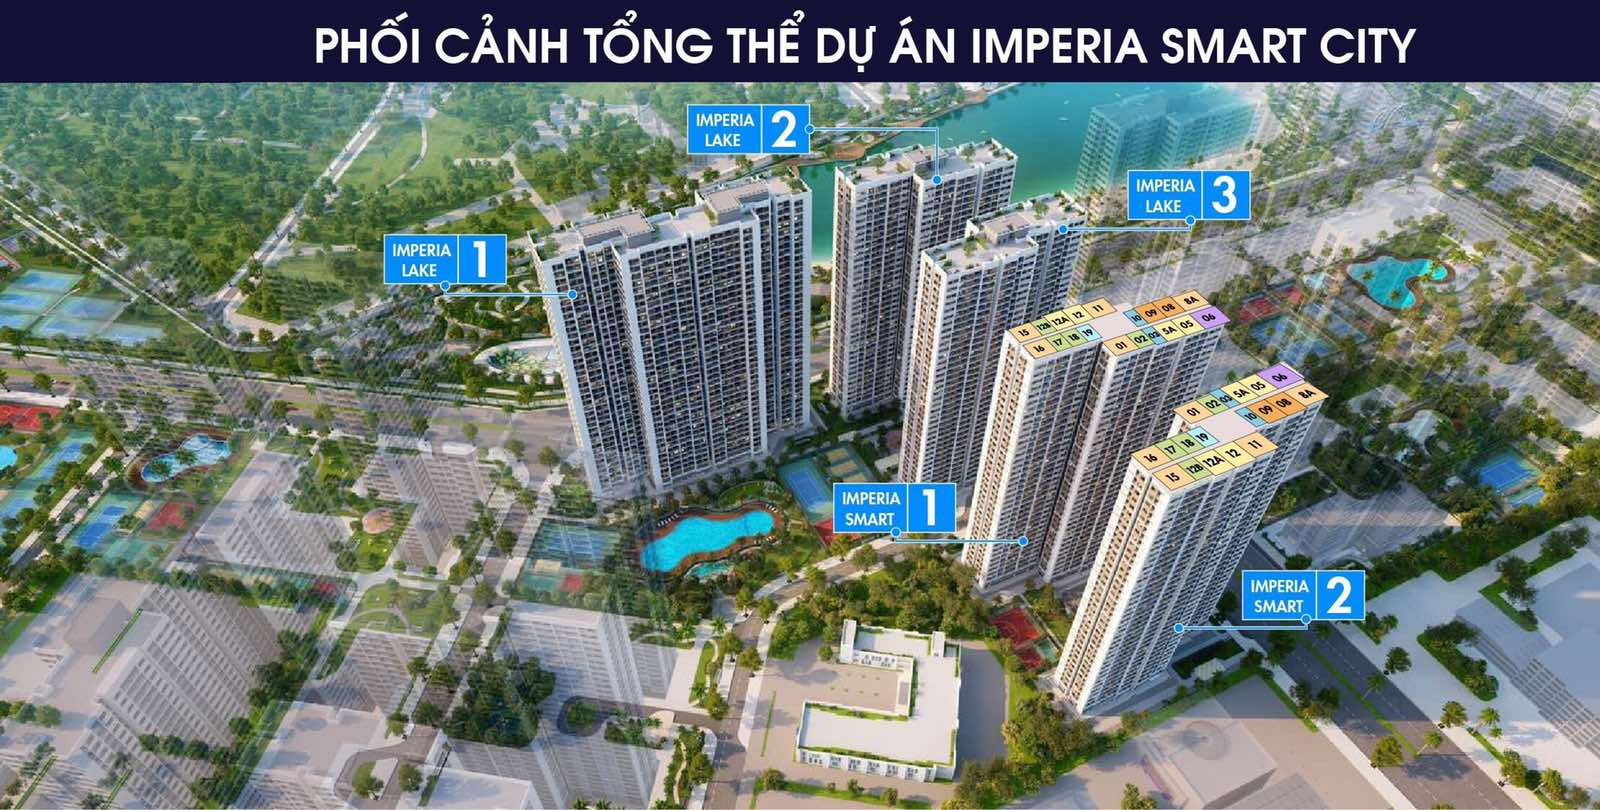 Phối cảnh Tổng thể Dự án MIK Imperia Smart City